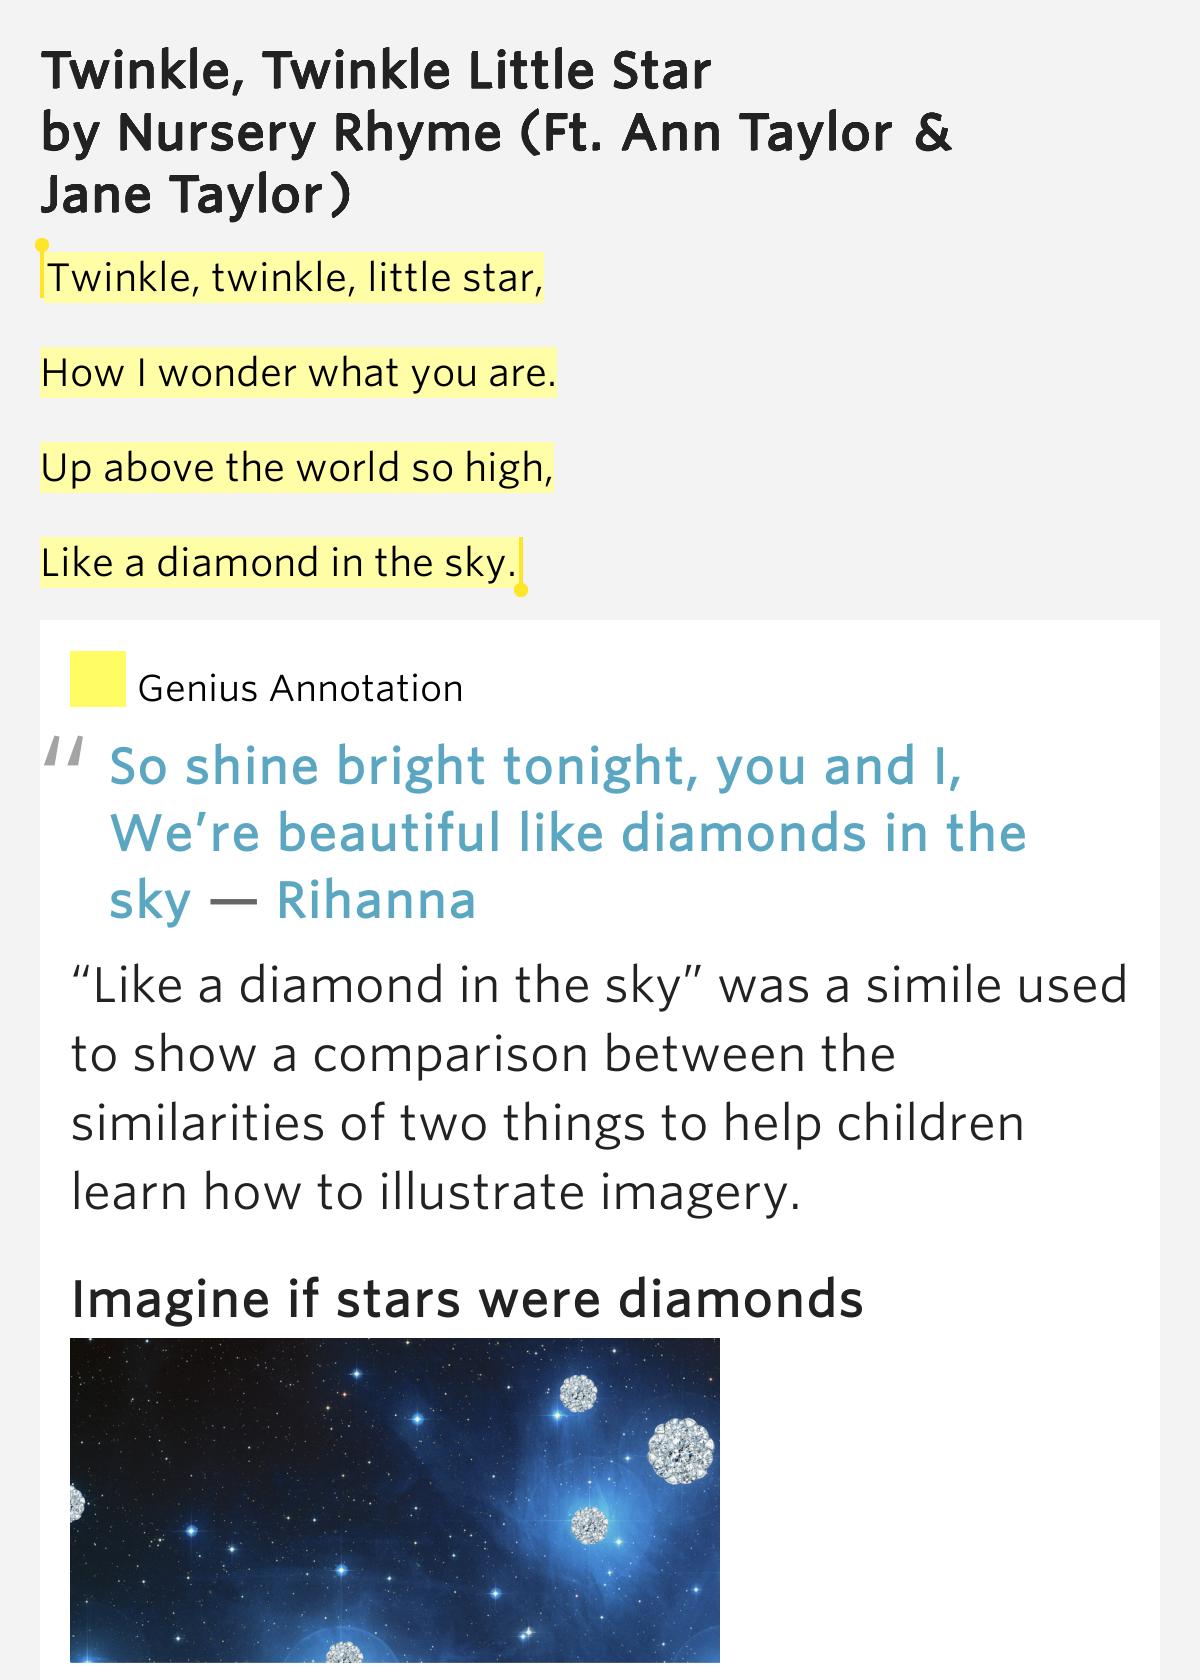 So beautiful like diamonds in the sky lyrics